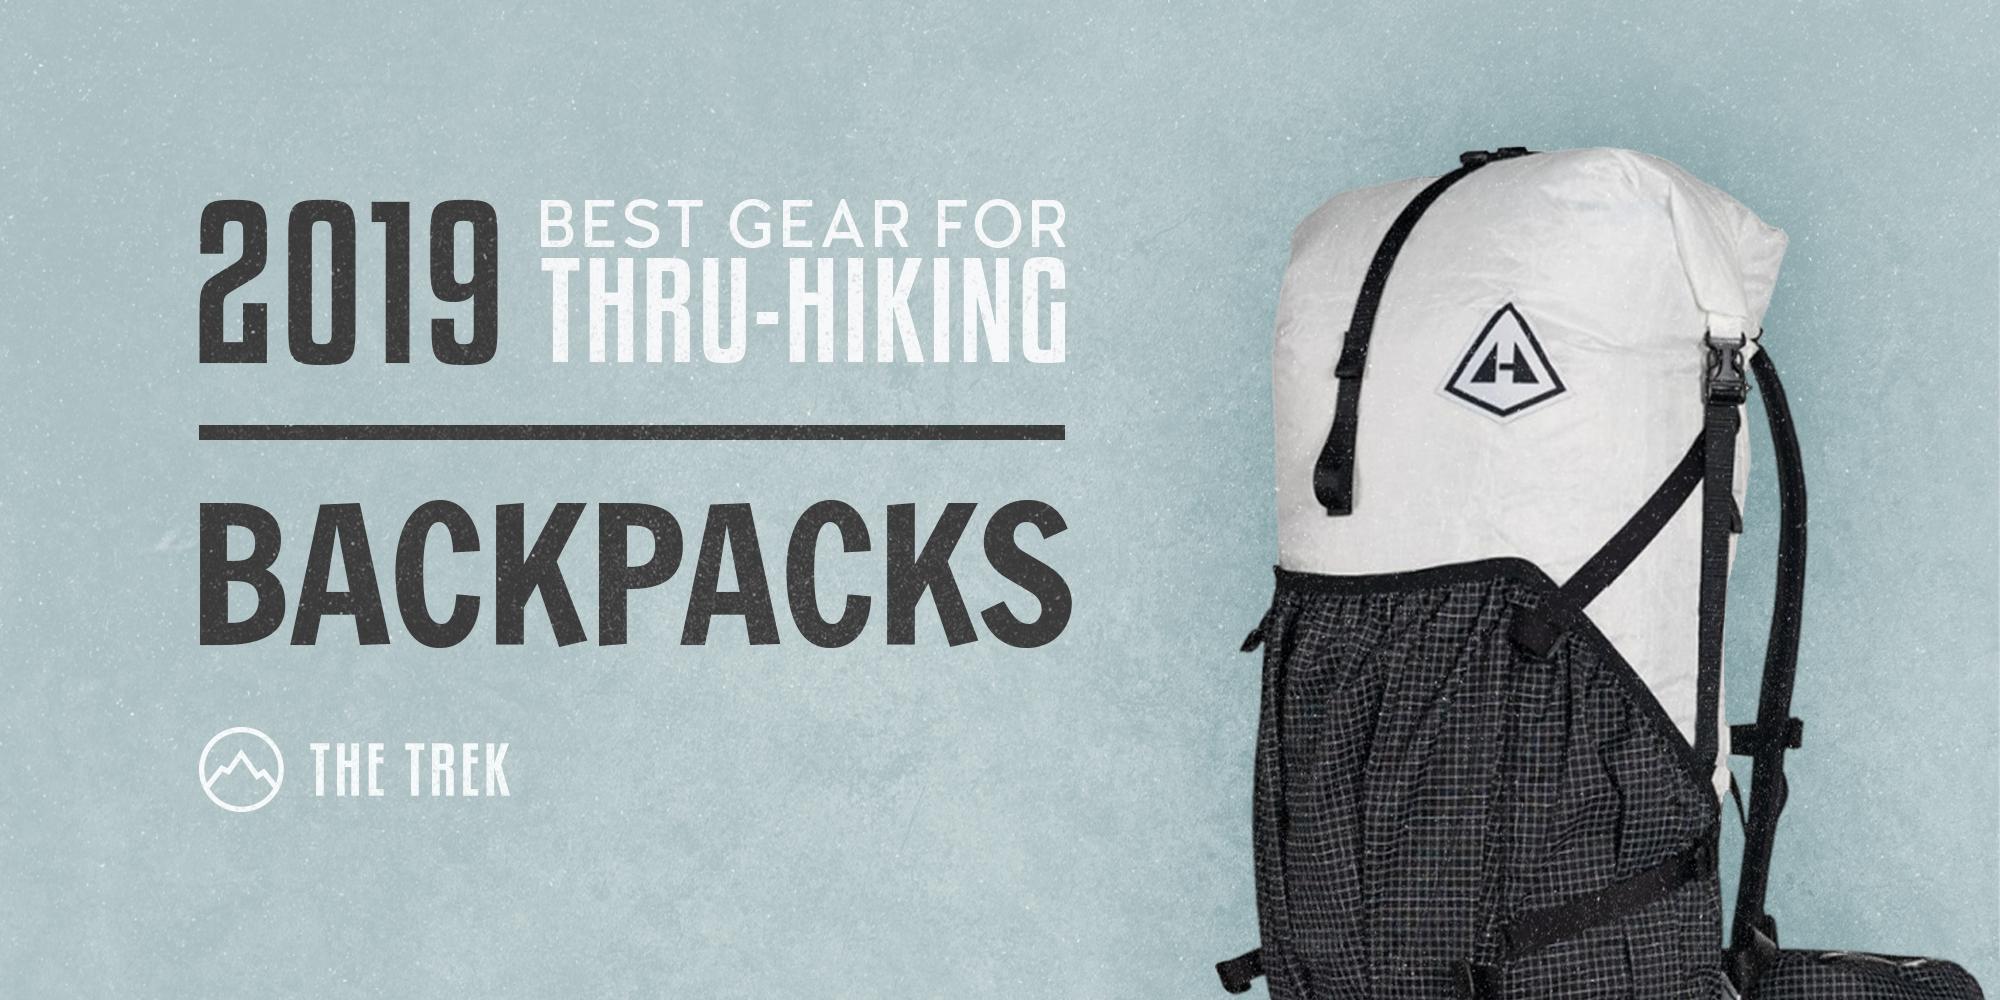 dd0bd3ffe4a The Best Backpacks for Thru-Hiking of 2019 - The Trek